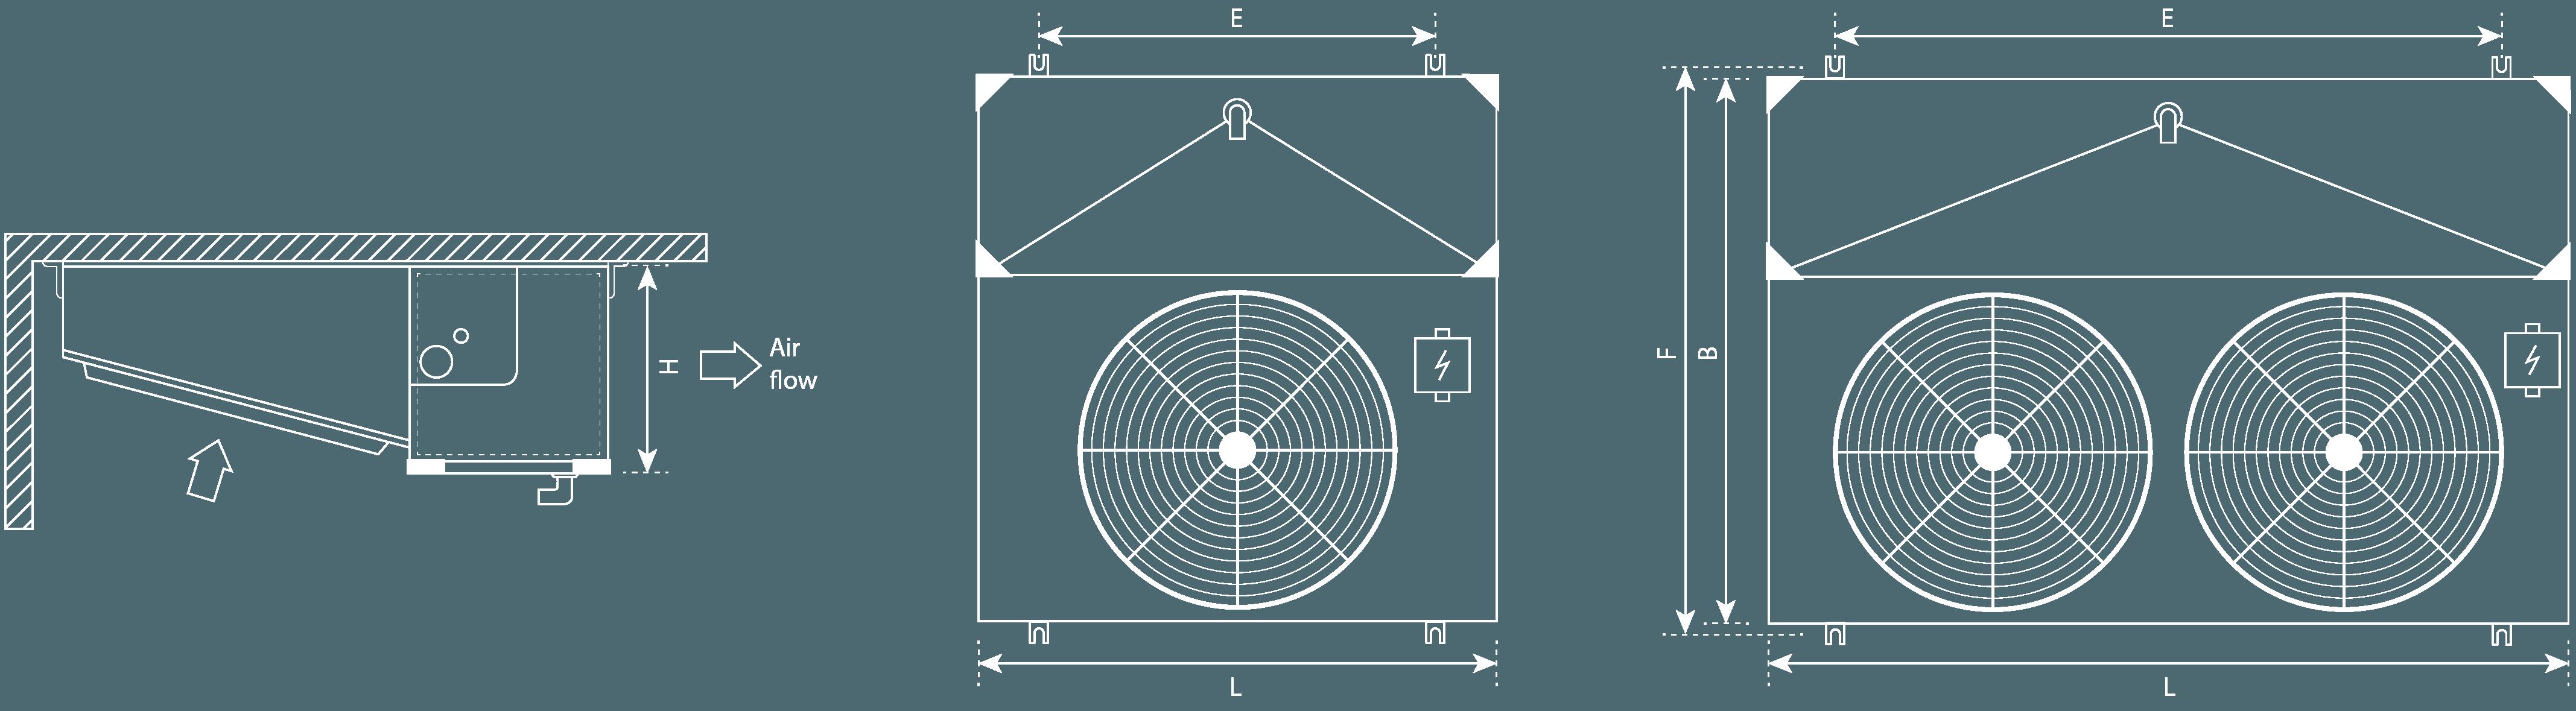 Single flow unit coolers technical sketch